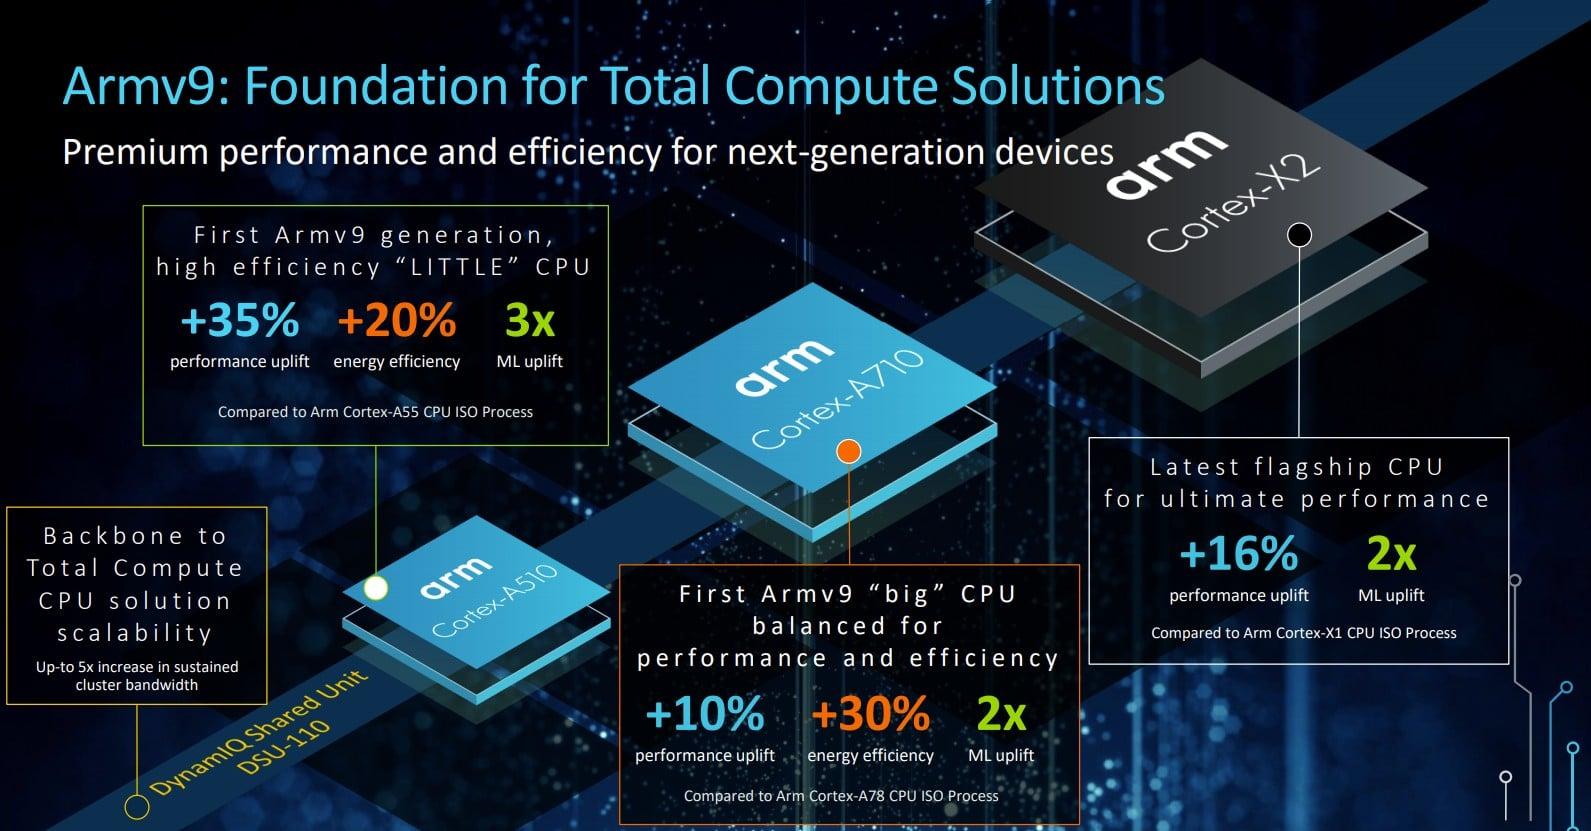 ARM анонсировала новые ядра ARMv9 и графику Mali